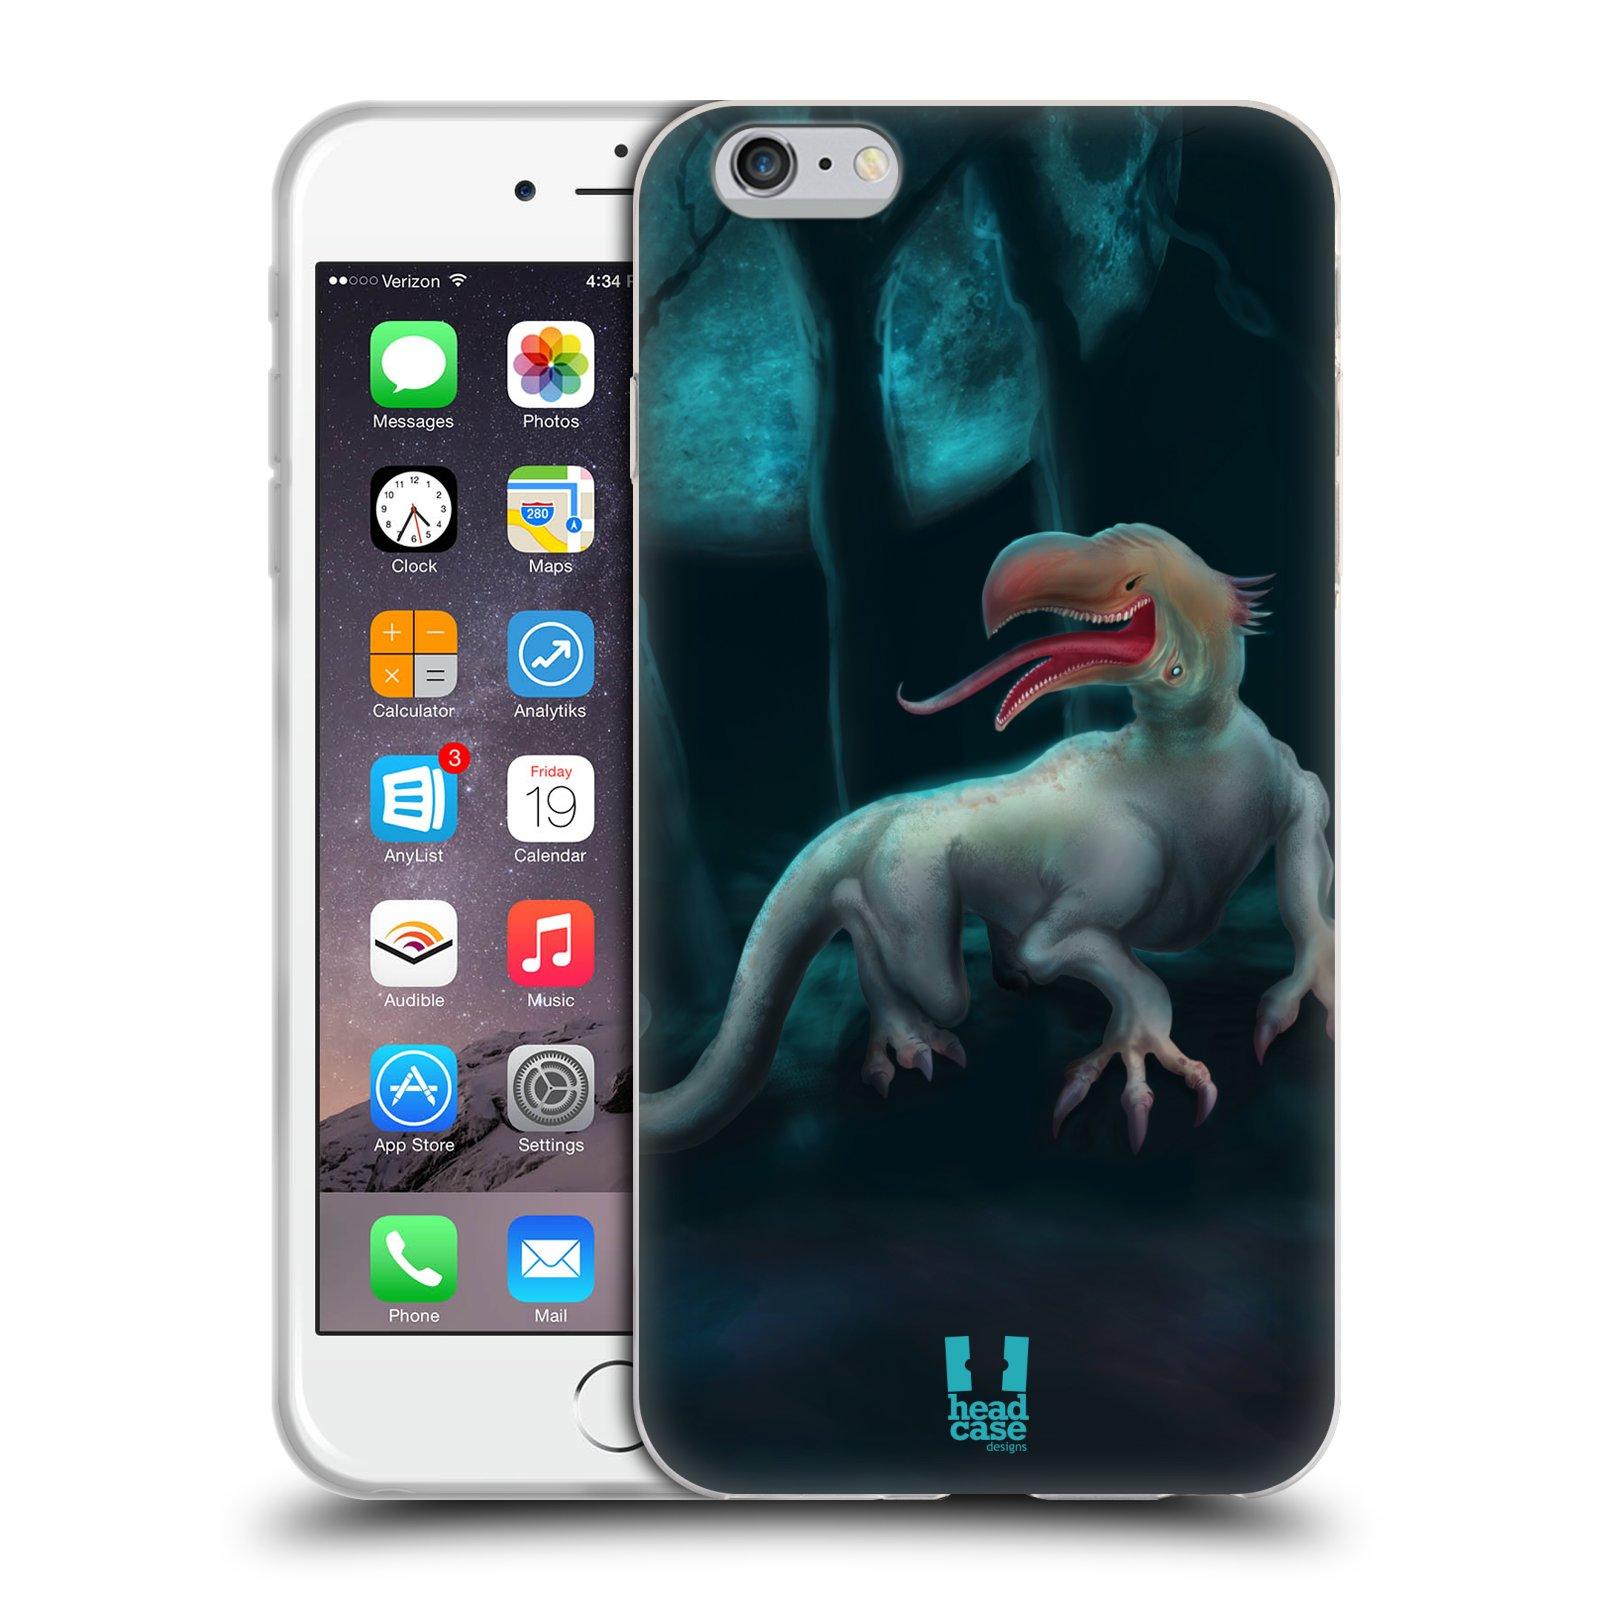 HEAD CASE silikonový obal na mobil Apple Iphone 6 PLUS/ 6S PLUS vzor Pohádkové příšery ORLÍ HLAVA